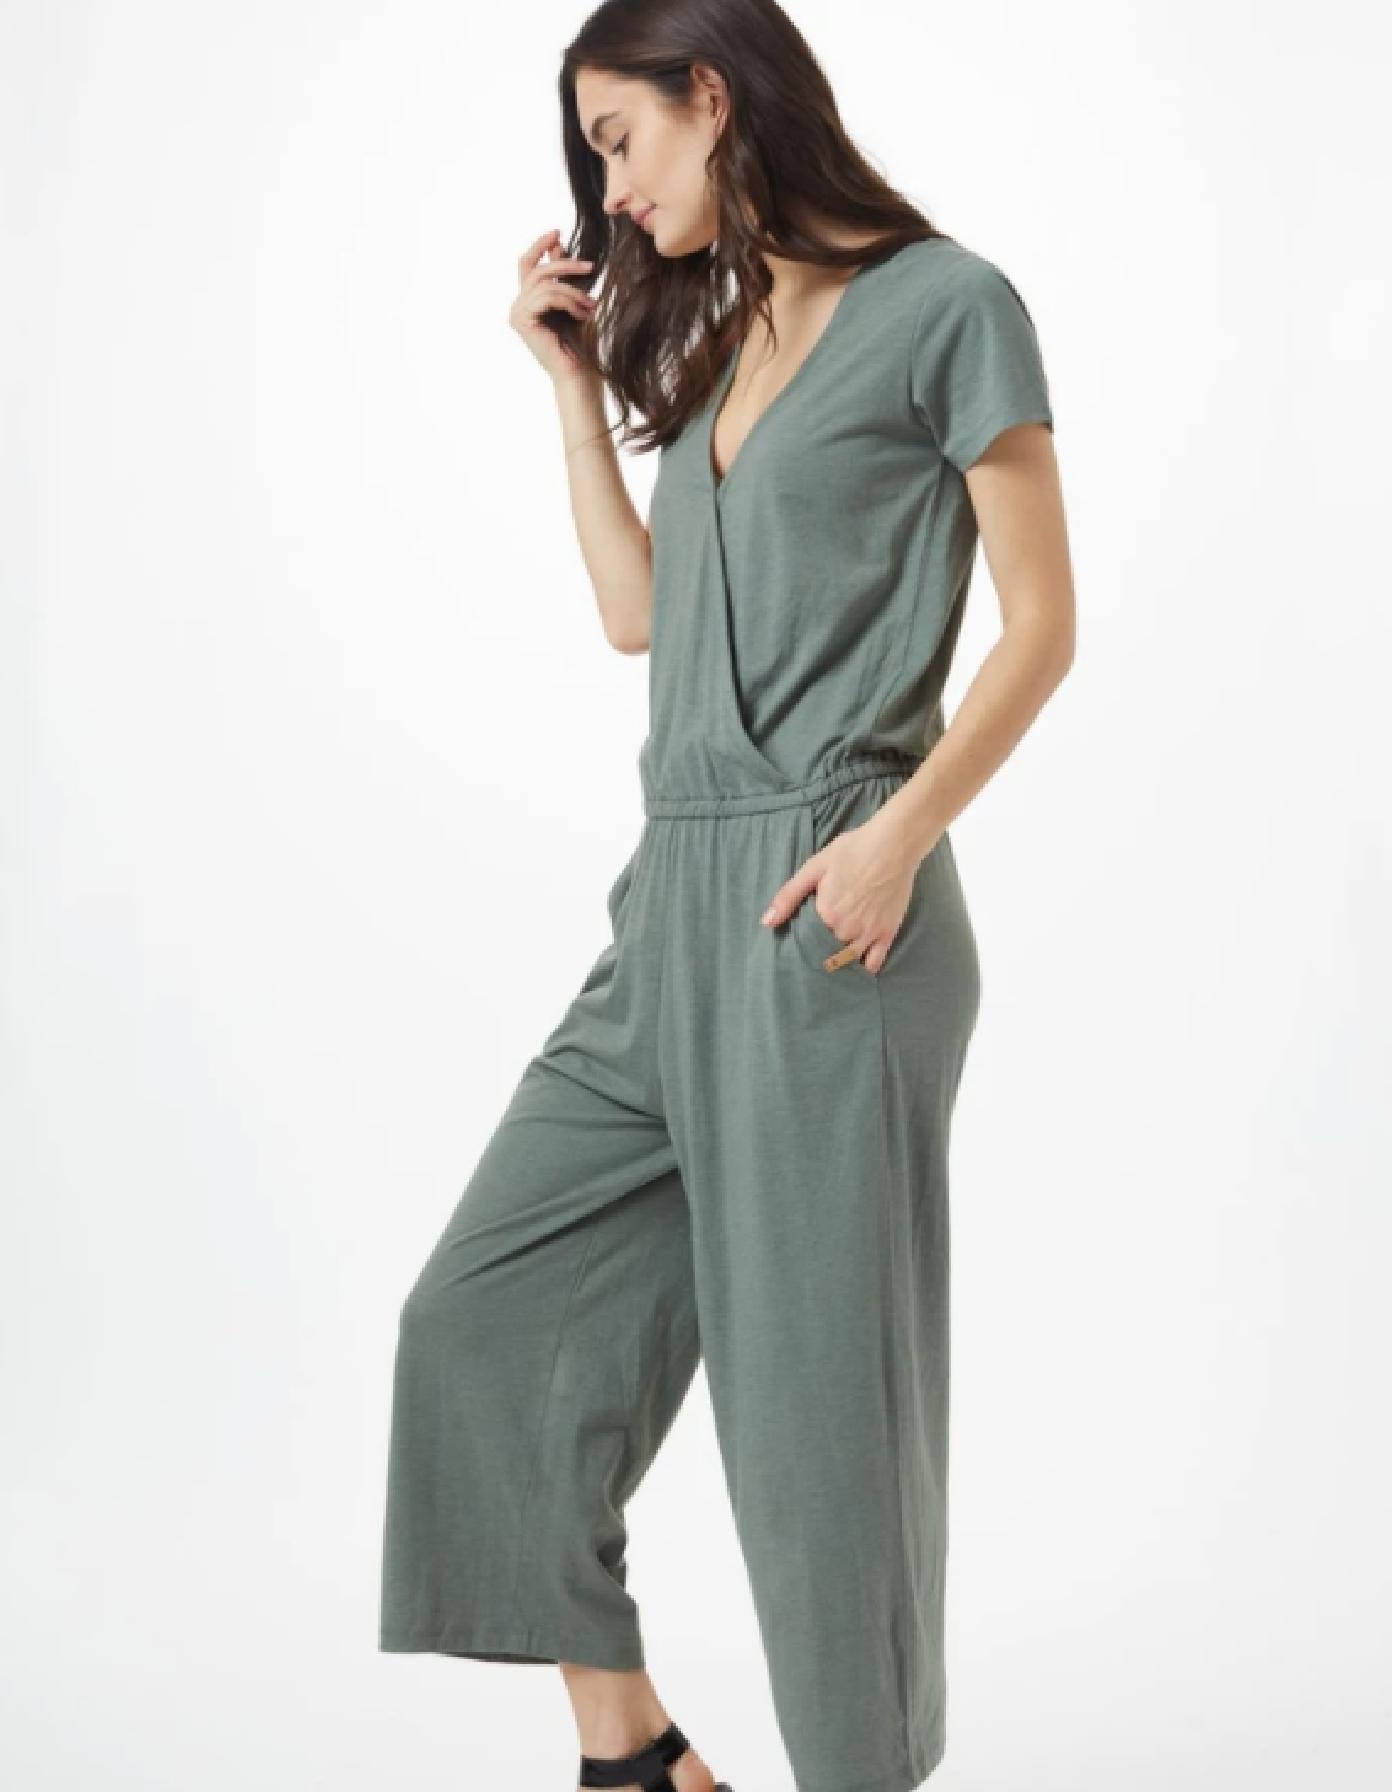 H & M Dri-FIT Fleece